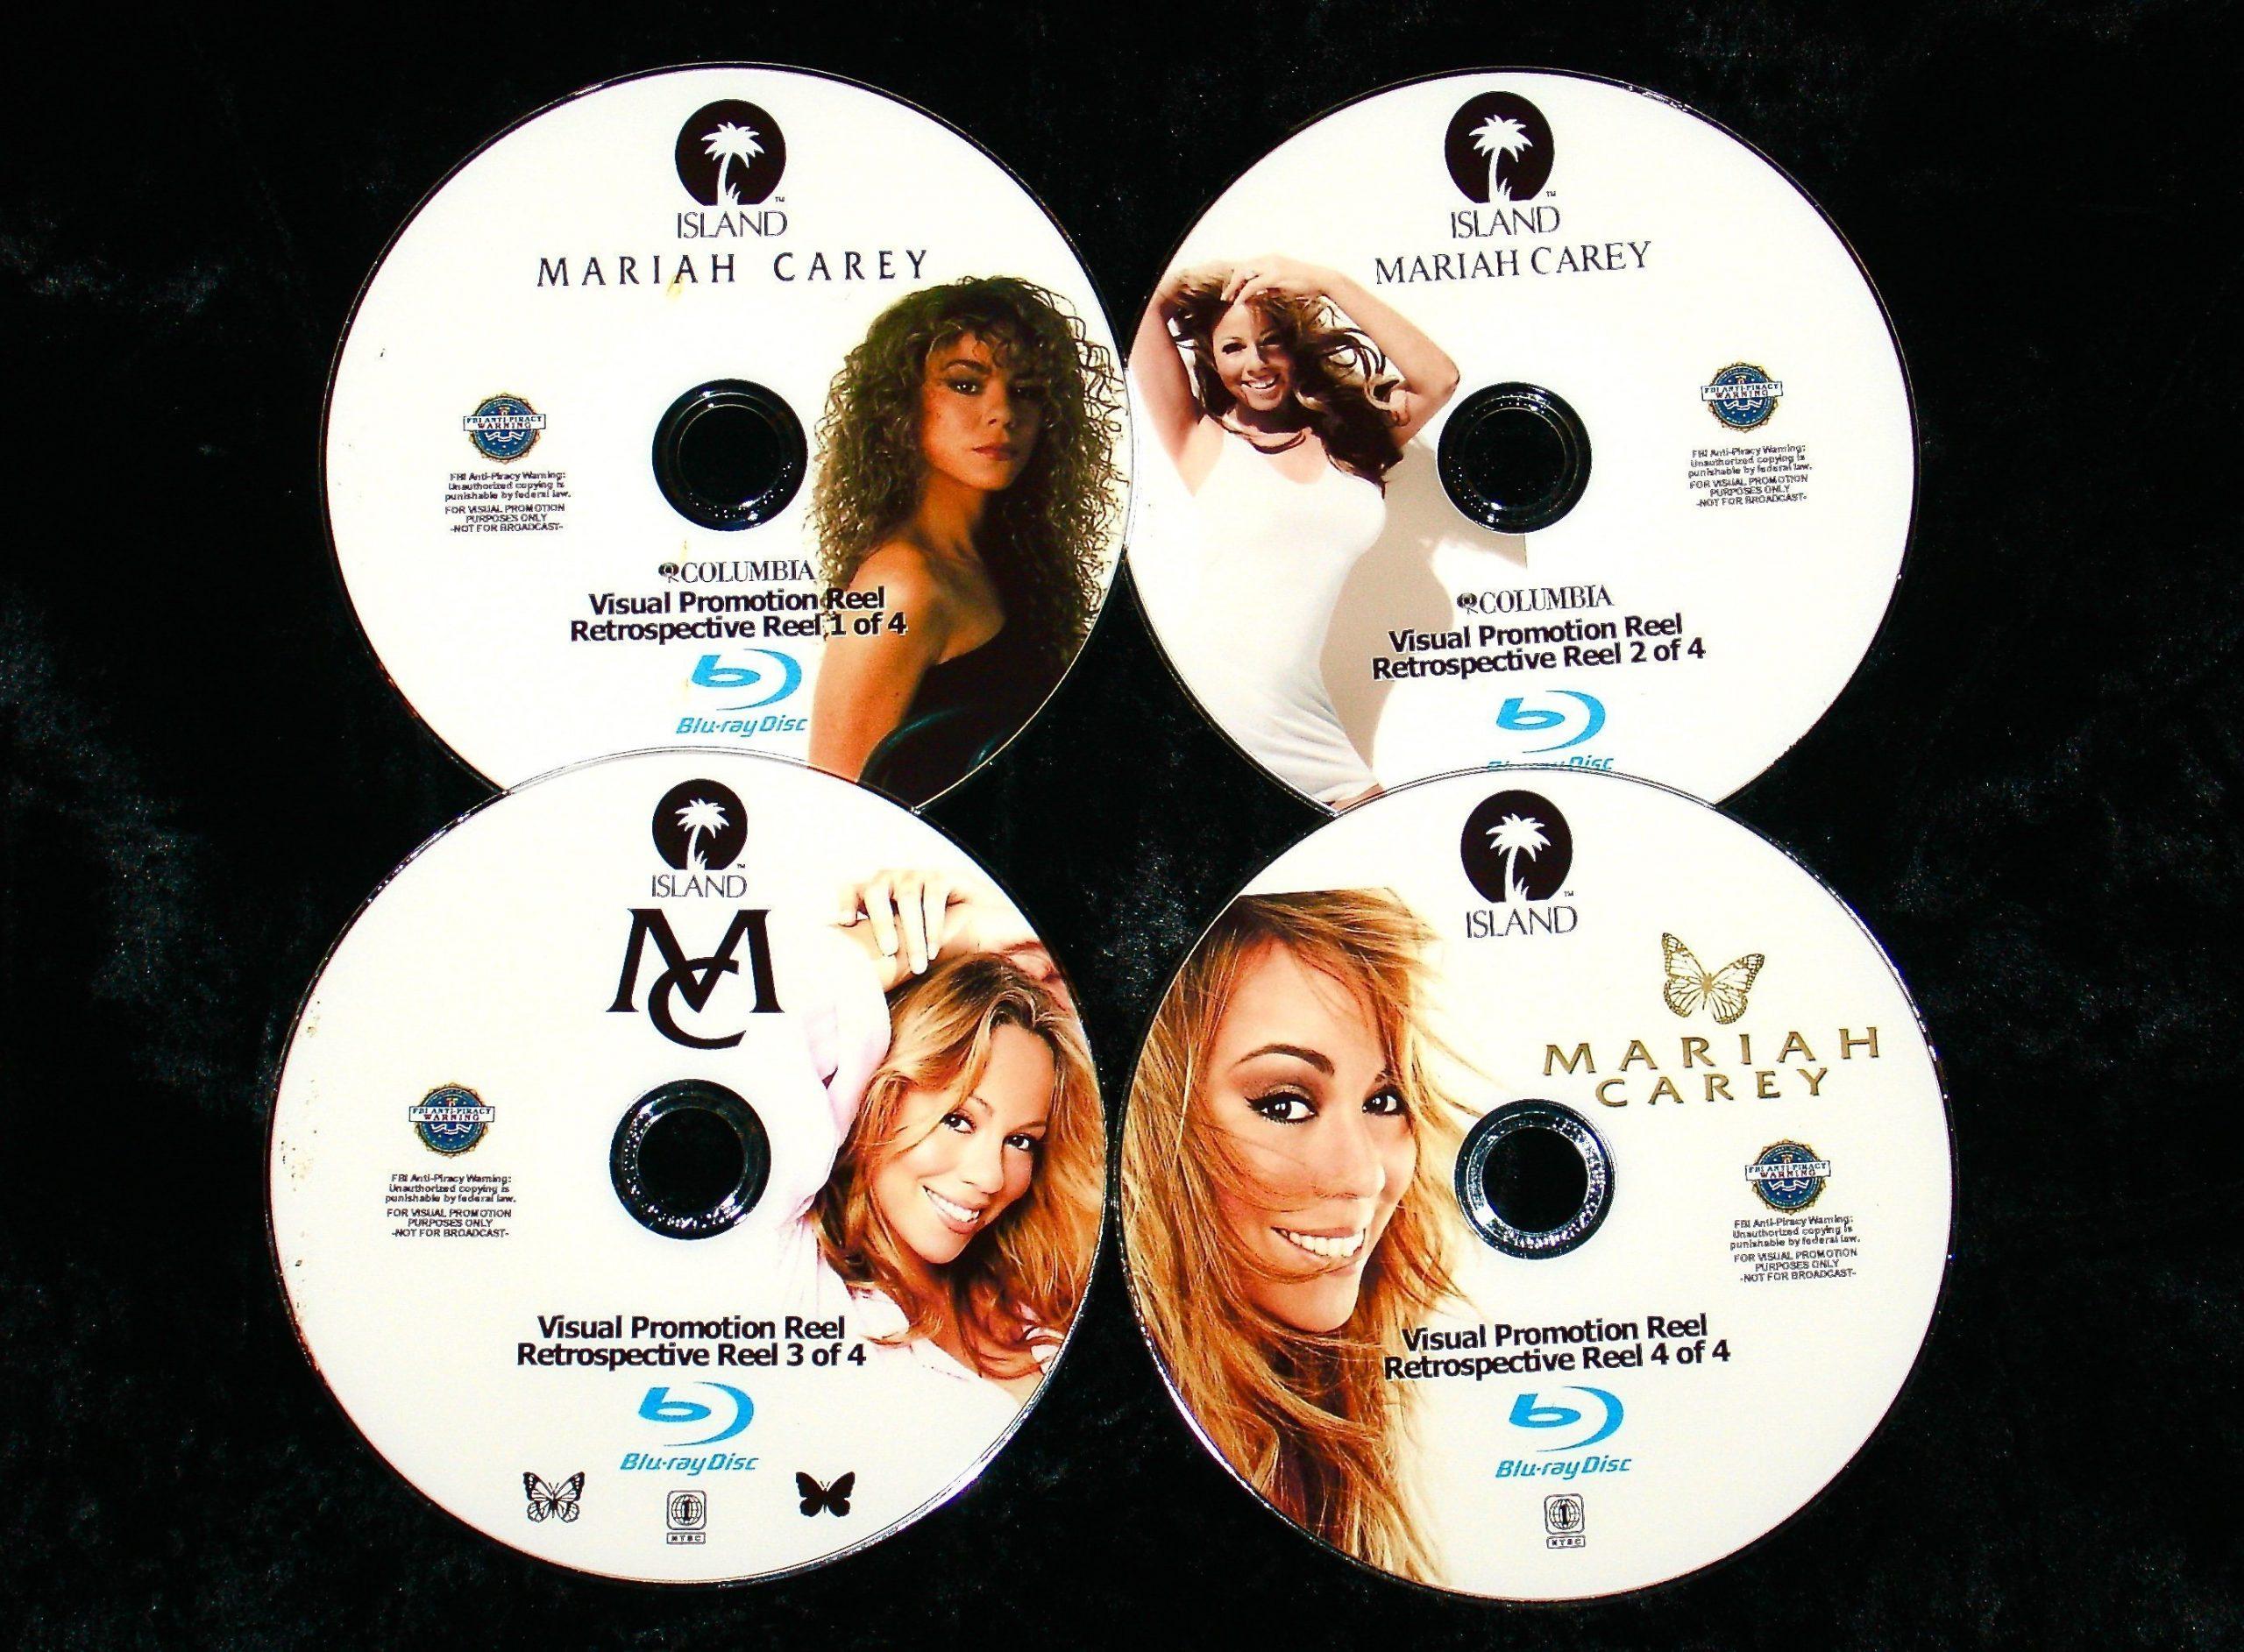 MARIAH CAREY Visual Promotion Reel 83 Music Videos 4 BLU-RAY DVD Set (Blu-Ray Format only) John Legend, Justin Bieber,  Luther Vandross, Jadakiss, Jermaine Dupri, Bone Thugs-n-Harmony, Snoop Dogg, Jay-Z